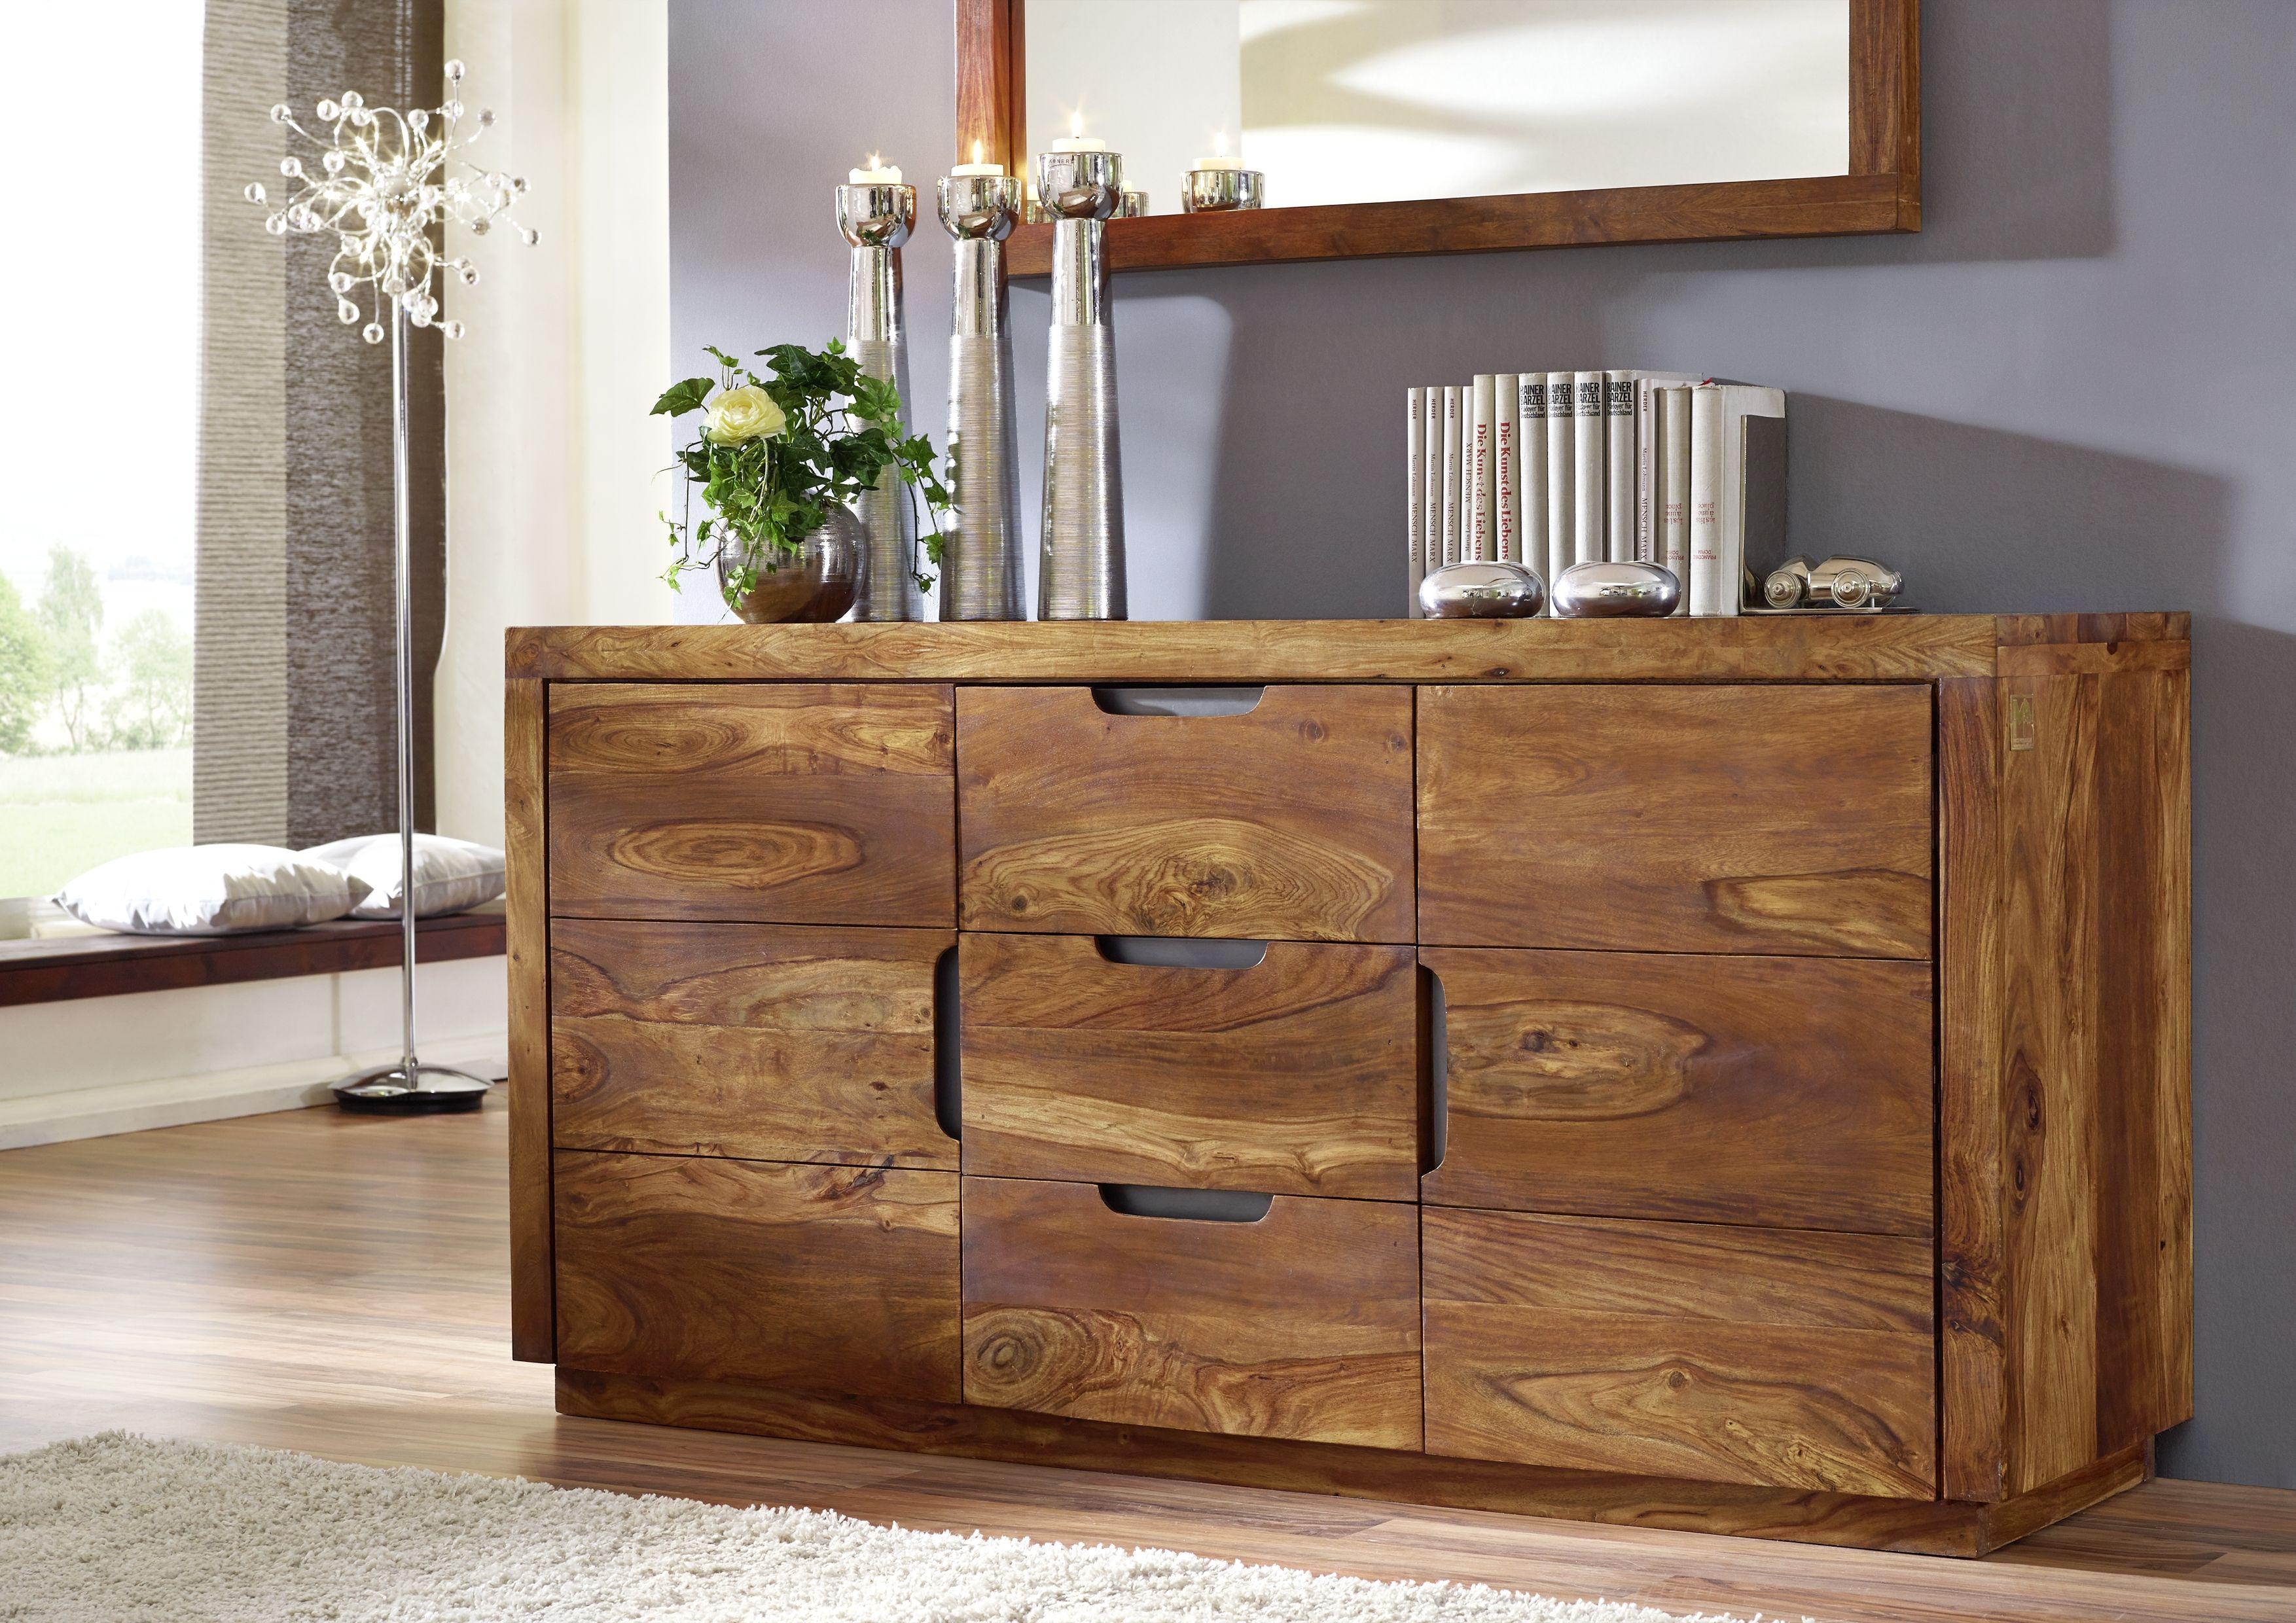 Vollholzmbel Sheesham Palisander lackiert  DUKE  prueba  Wood furniture Furniture Wooden